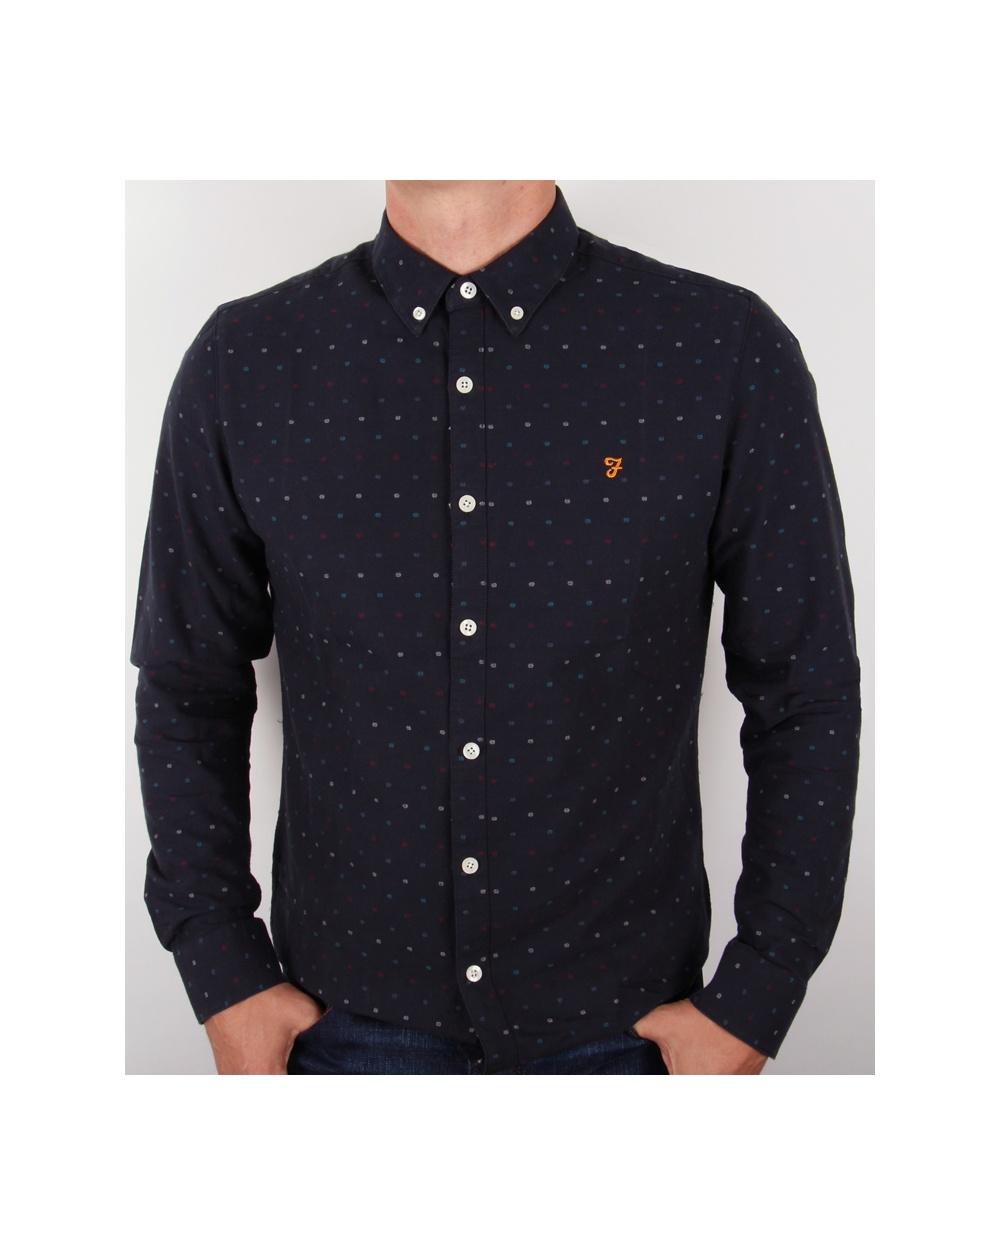 Farah Garfield Slim Fit Shirt Navy Blue Long Sleeve Cotton